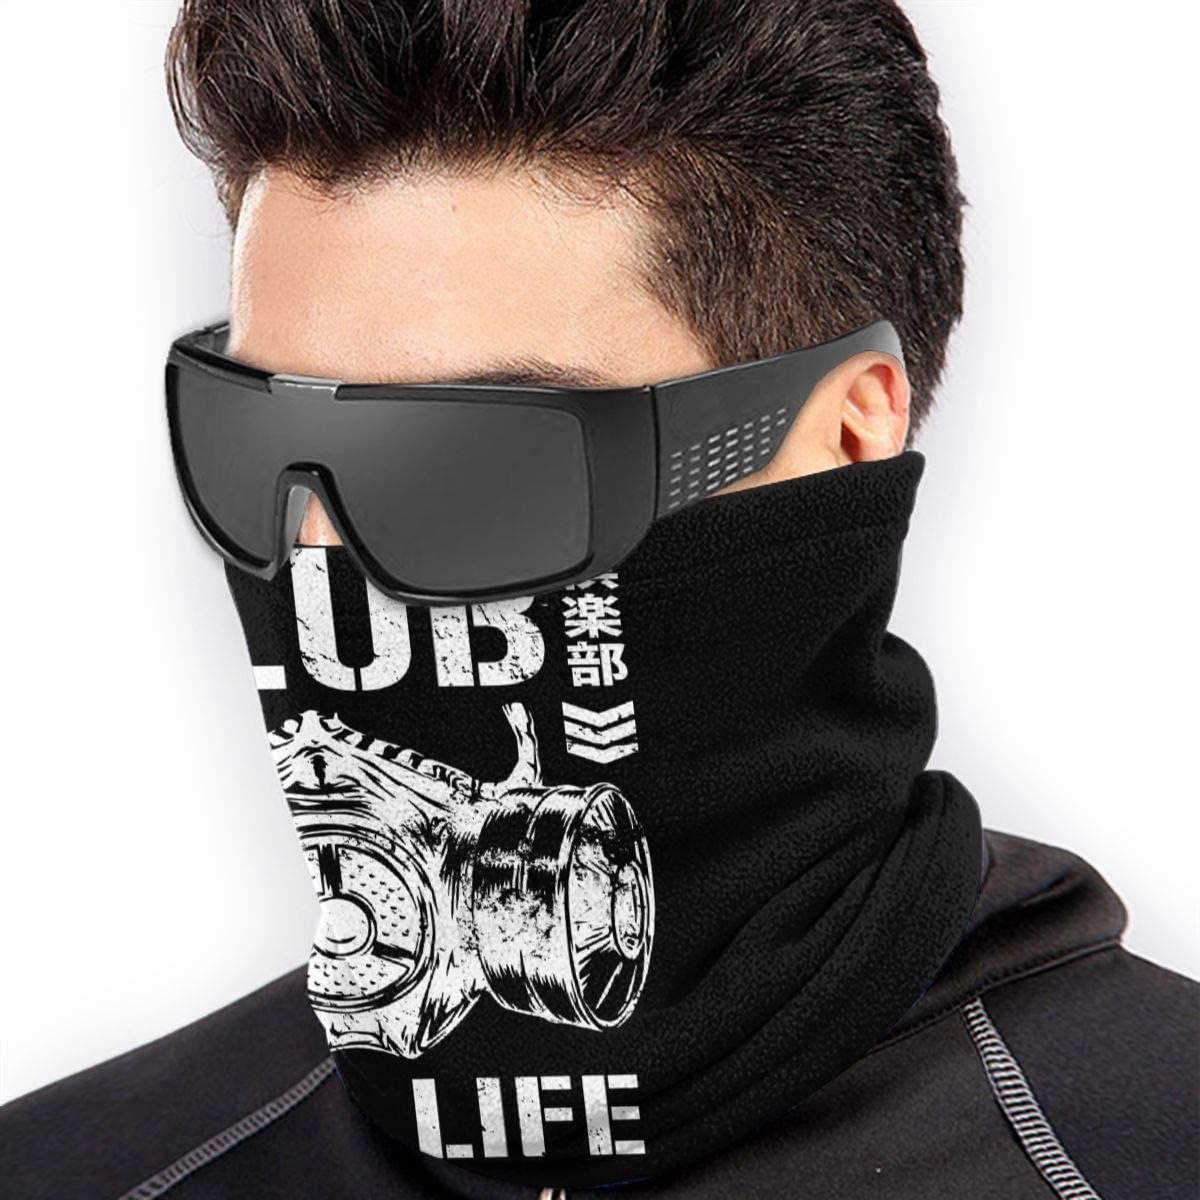 Bullet Clubs Logos Neck Warmer Neck Gaiter For Men Women Face Mask /& Shield For Outdoors Winter Fleece Scarf